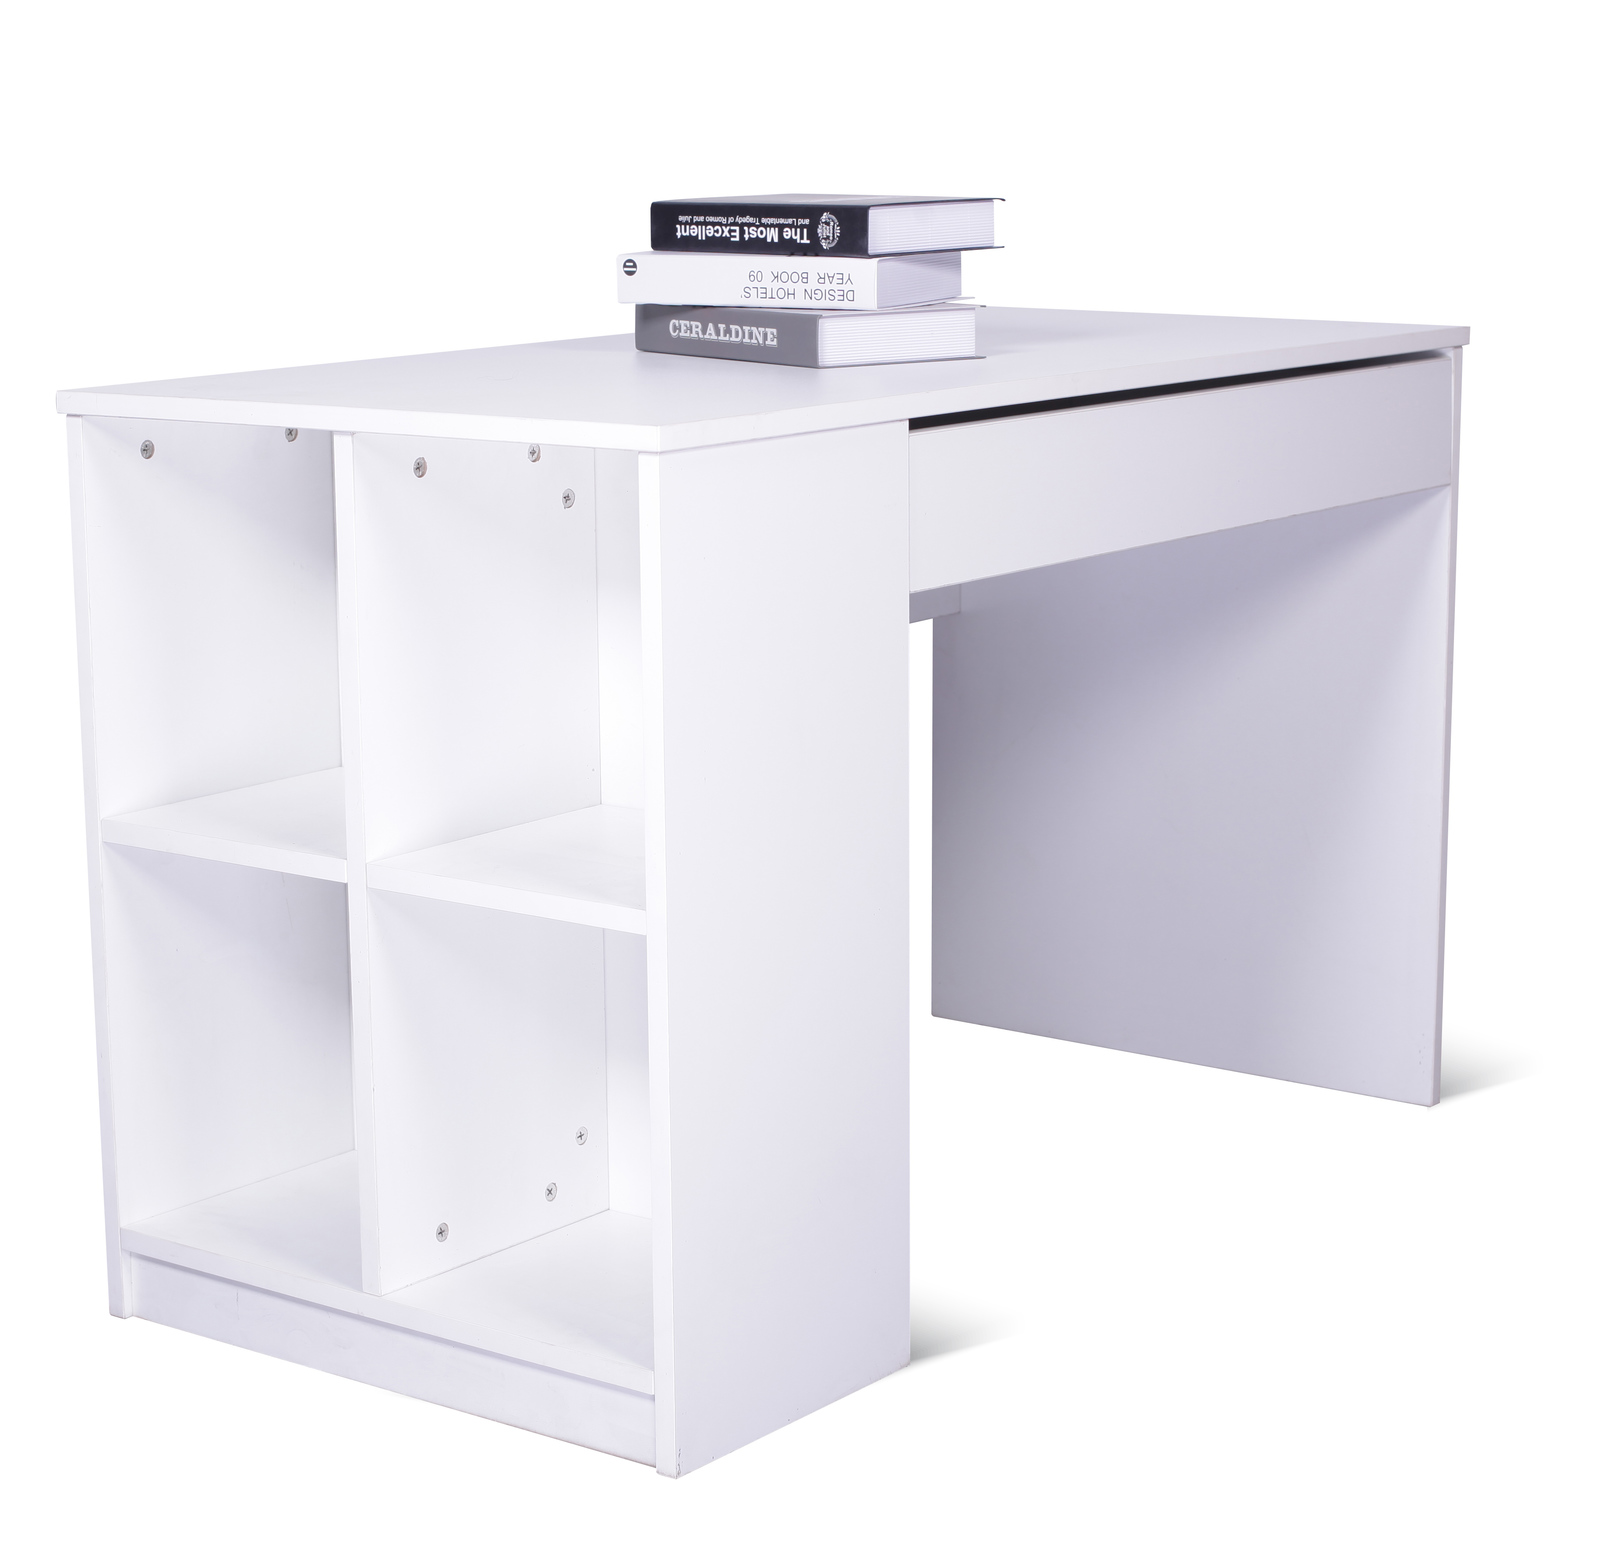 Gorilla Office: Home Office Desk with Shelves image